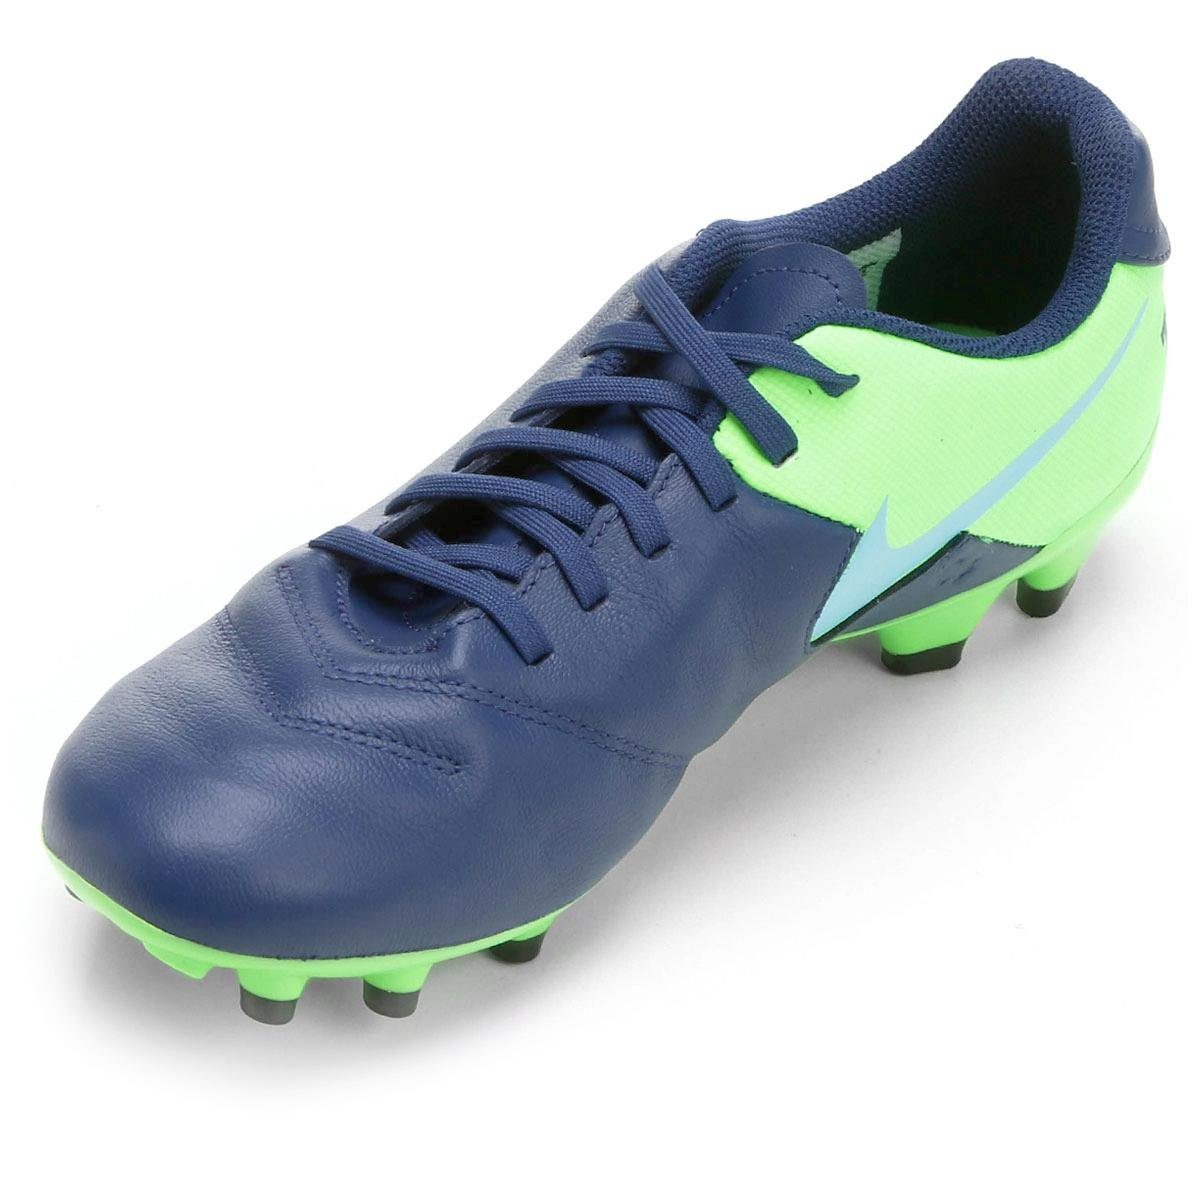 1b583588e4 Chuteira Campo Nike Tiempo Genio 2 Leather FG - Compre Agora